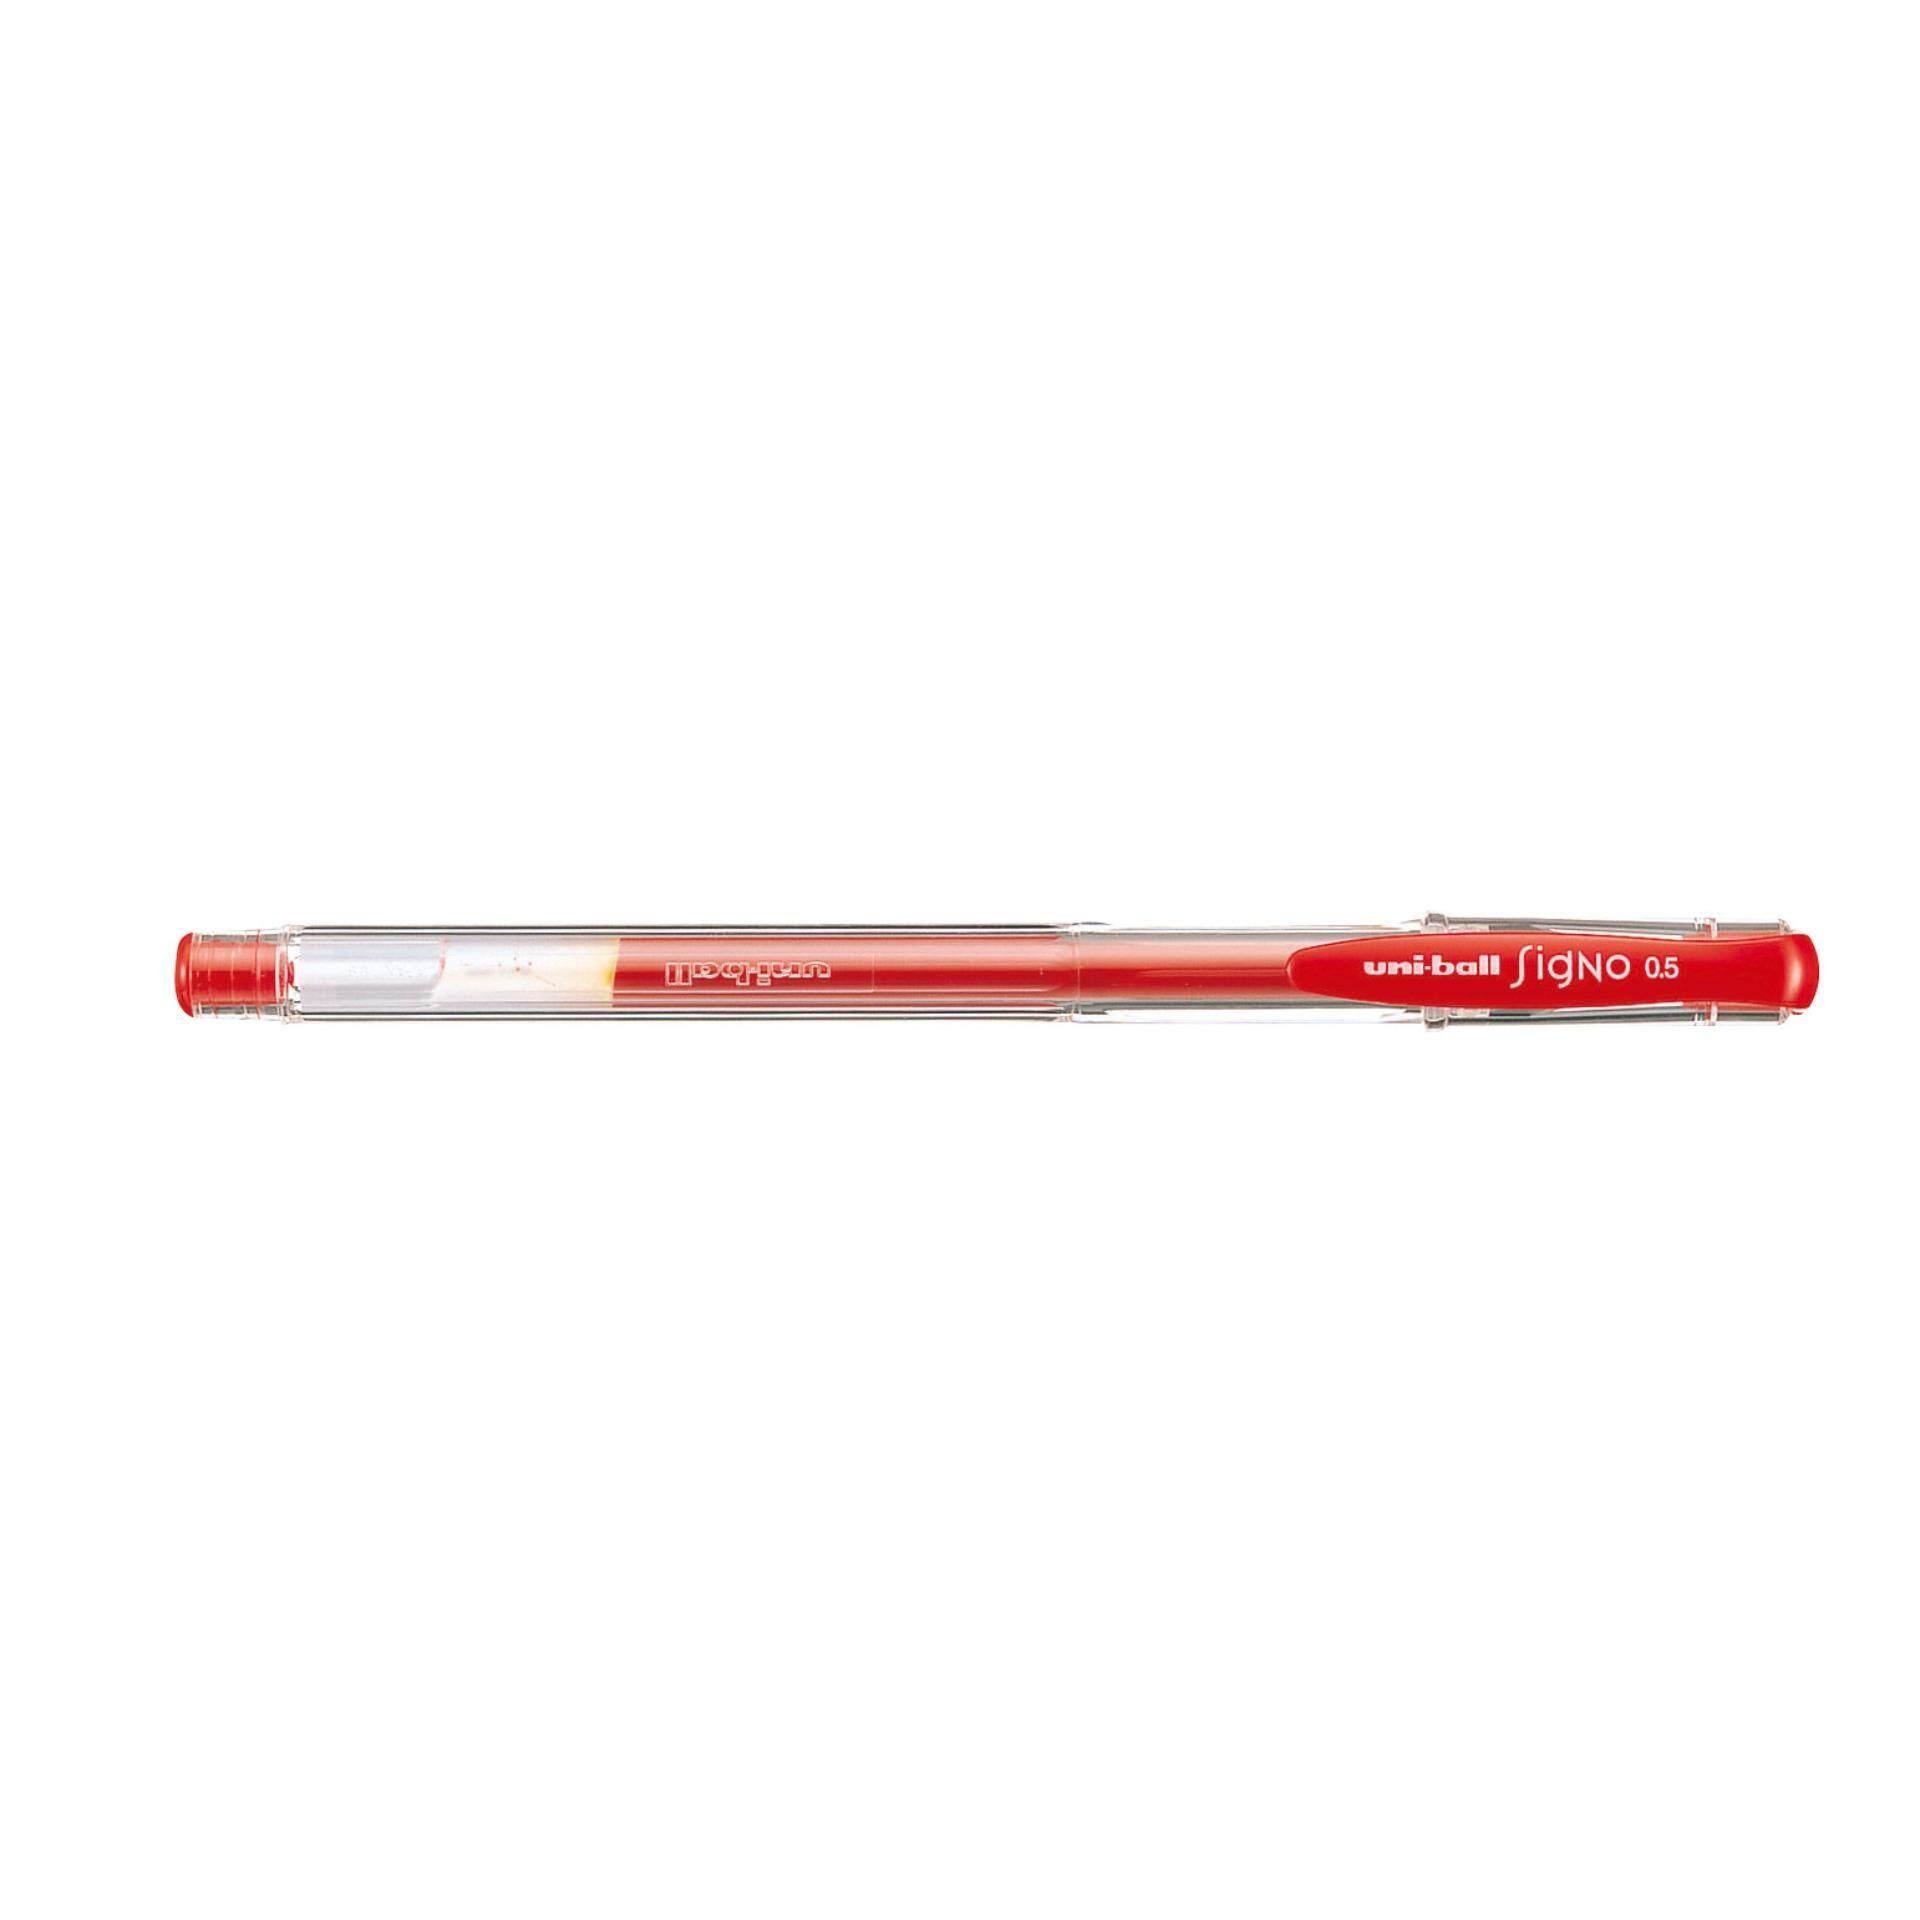 Uniball SIGNO Roller Gel Pen 12pcs/box 0.5mm (Red Ink)